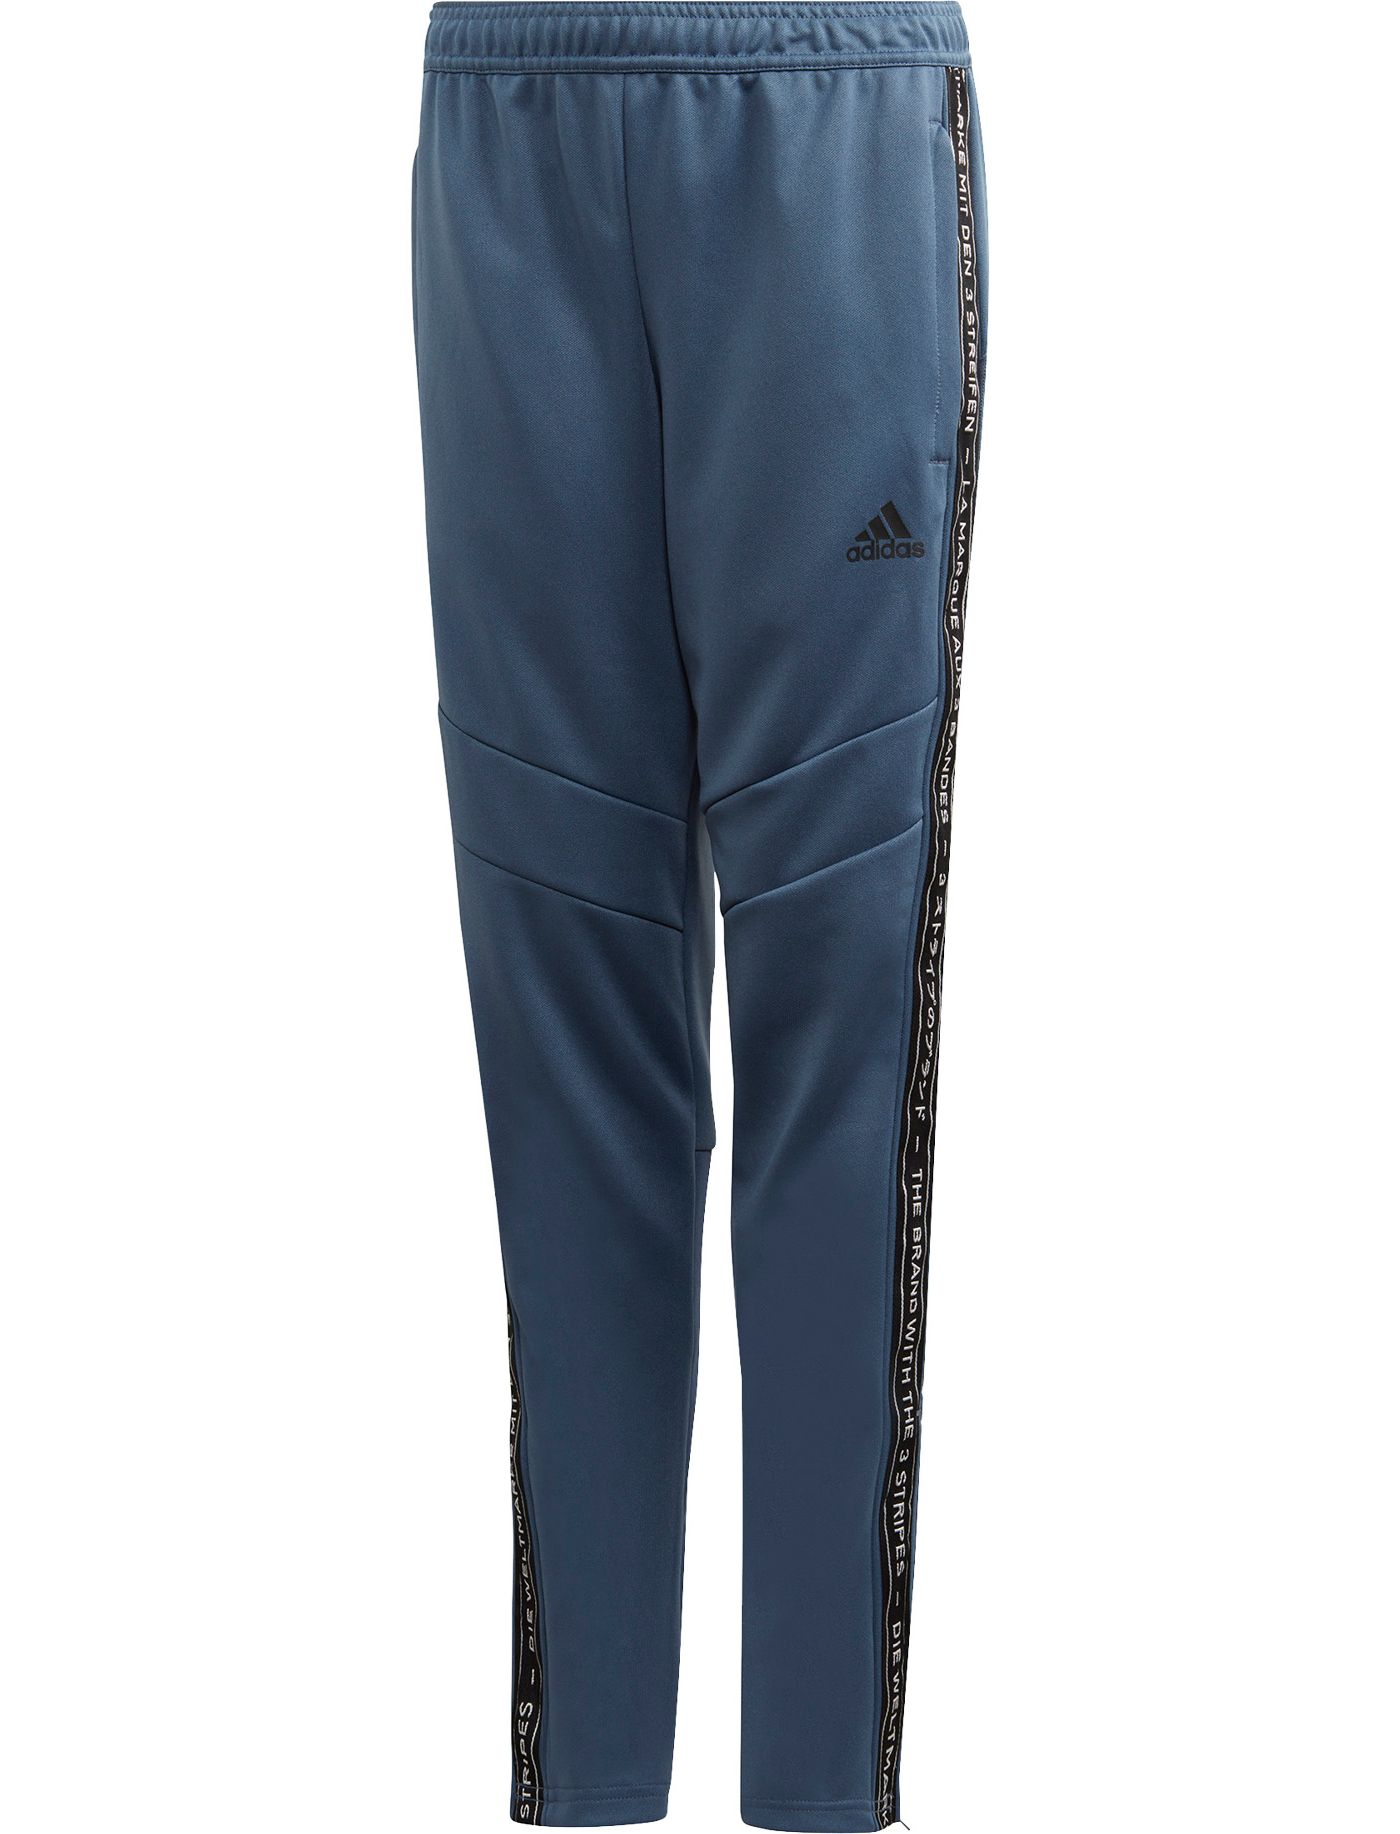 adidas Boys' Tiro 19 Taping Training Pants